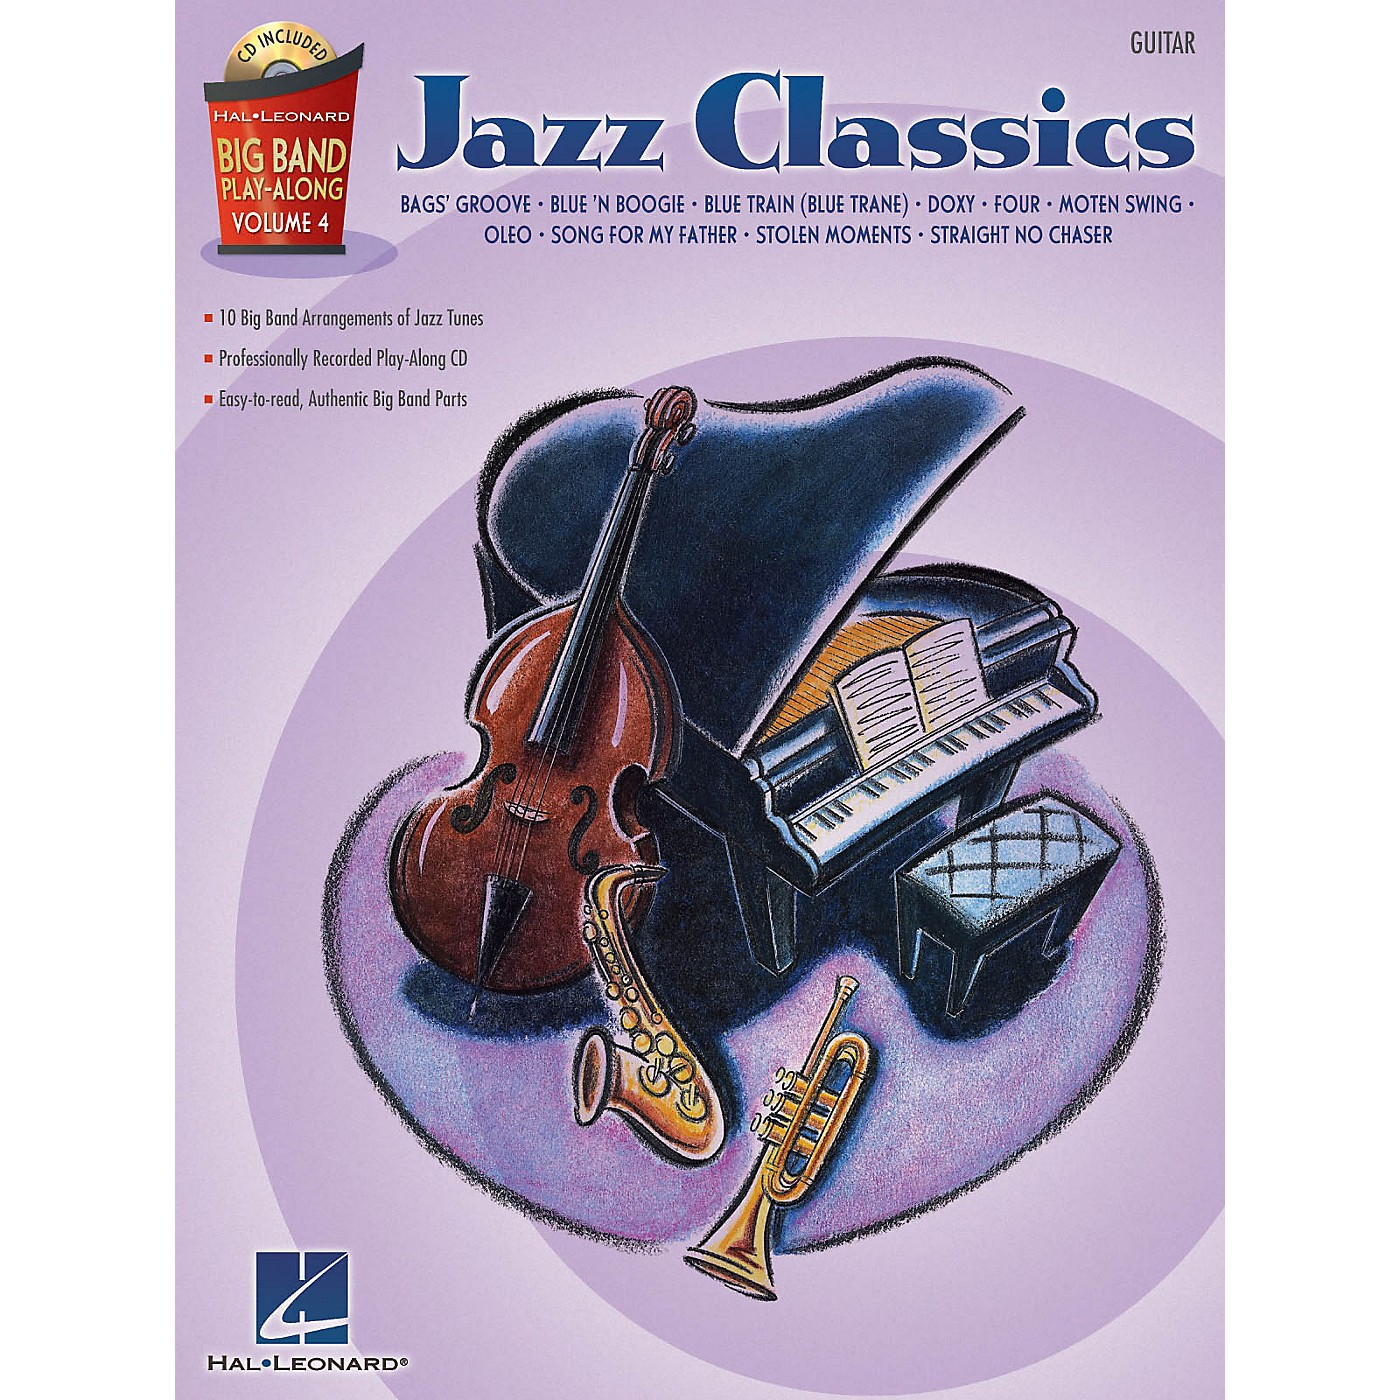 Hal Leonard Jazz Classics - Guitar (Big Band Play-Along Volume 4) Big Band Play-Along Series Softcover with CD thumbnail